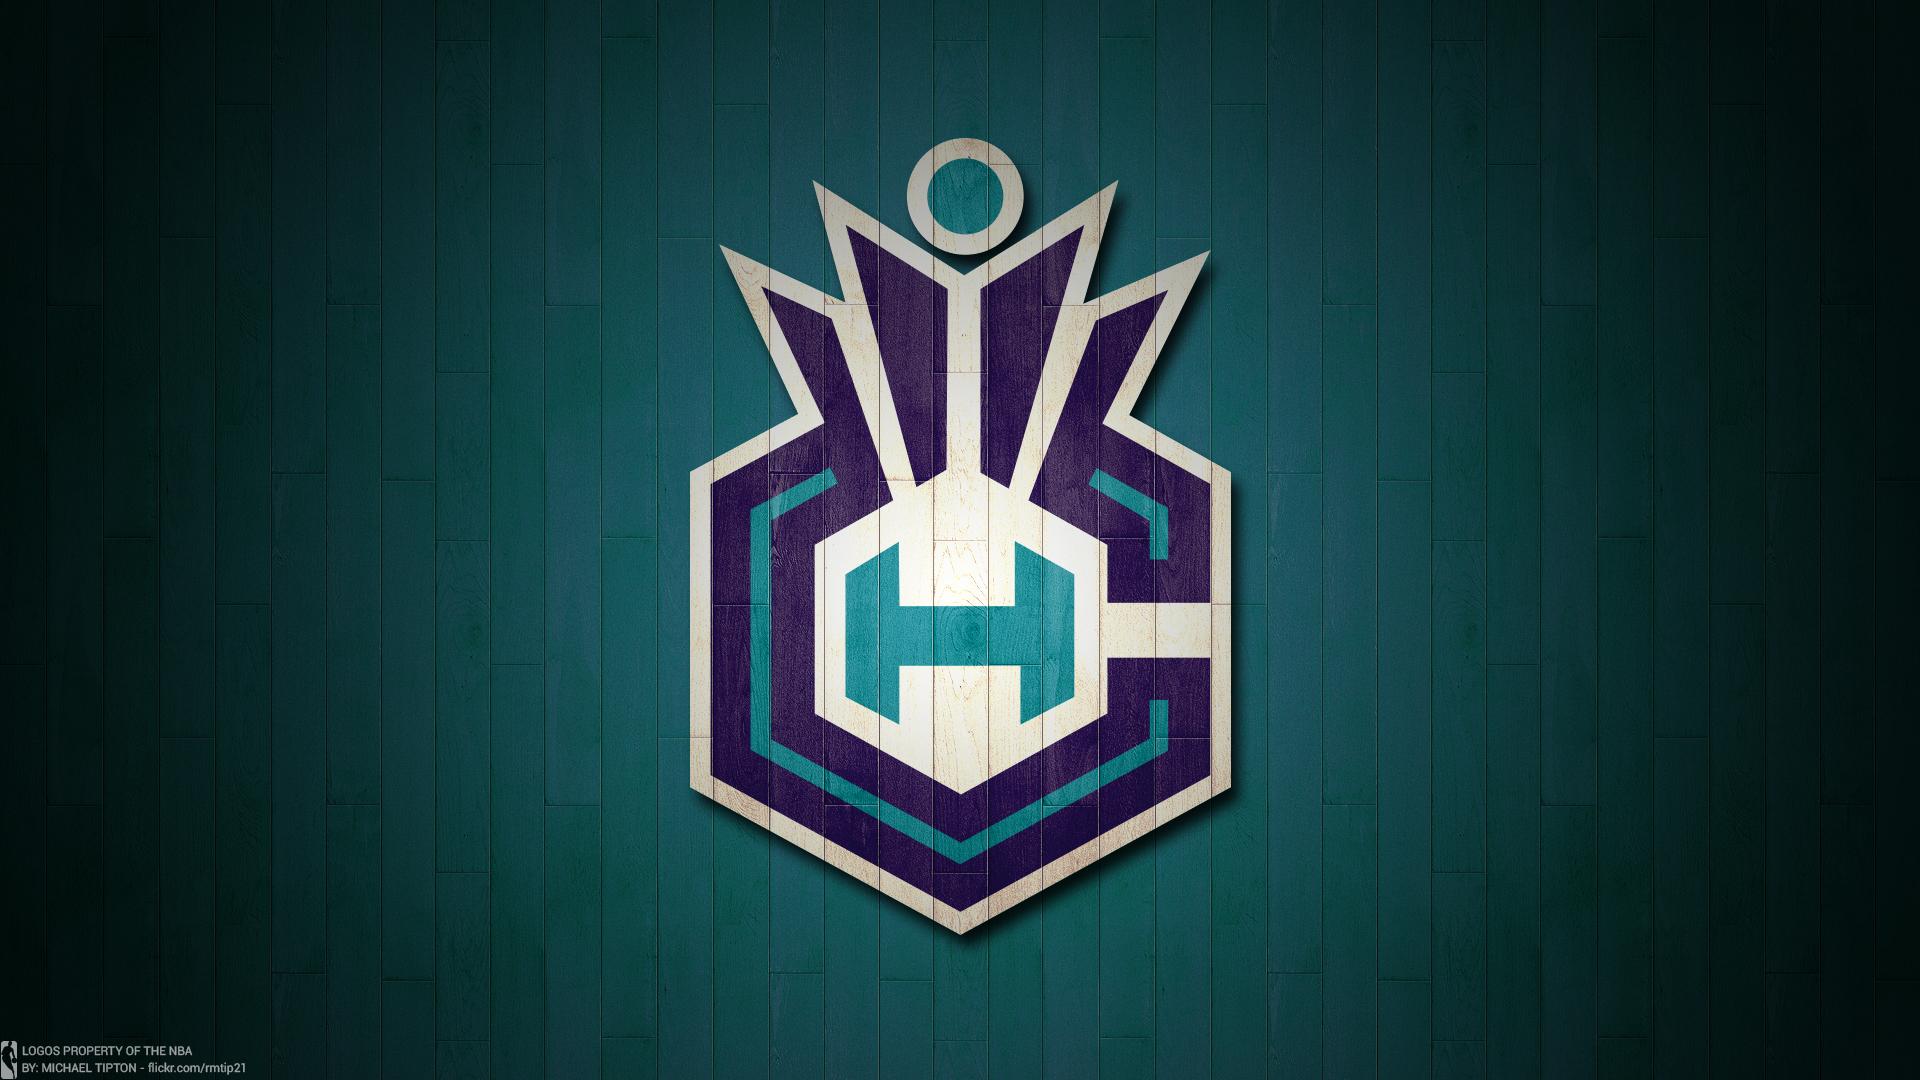 Charlotte Hornets Basketball Team HD Wallpaper Background Image 1920x1080